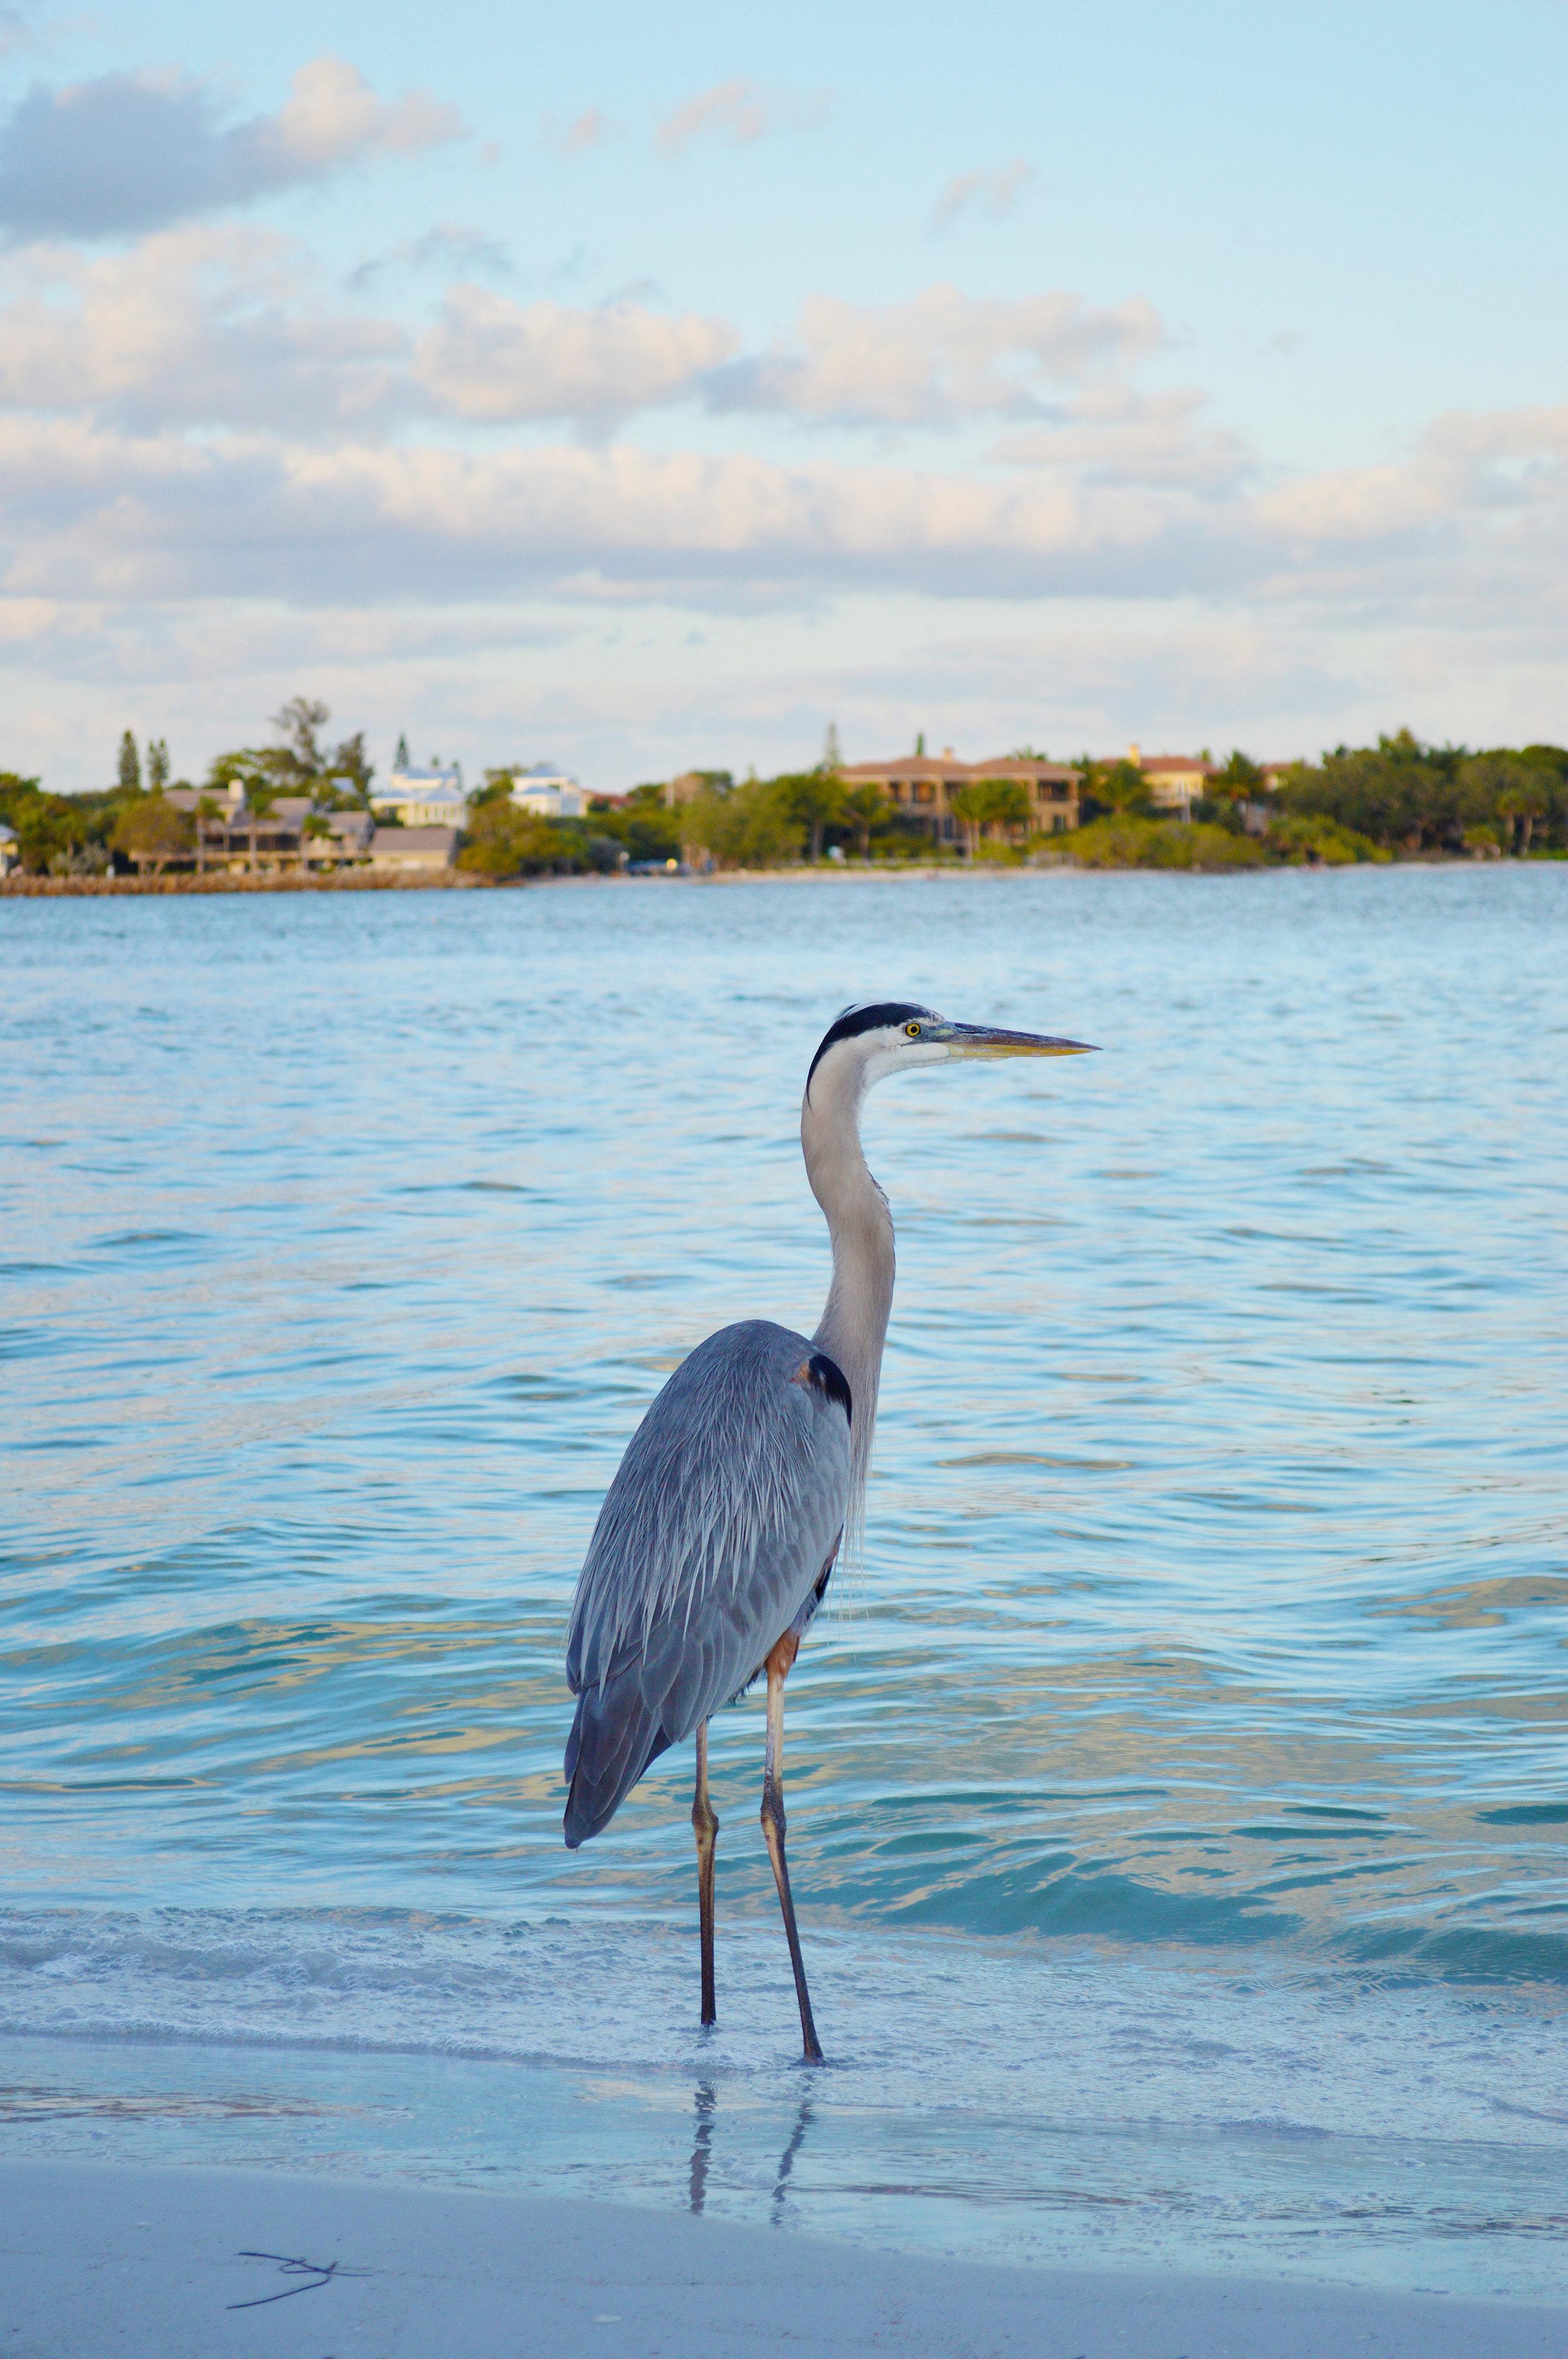 Lido Key Sarasota Florida Bird on Beach Photo by Kristen Laczi